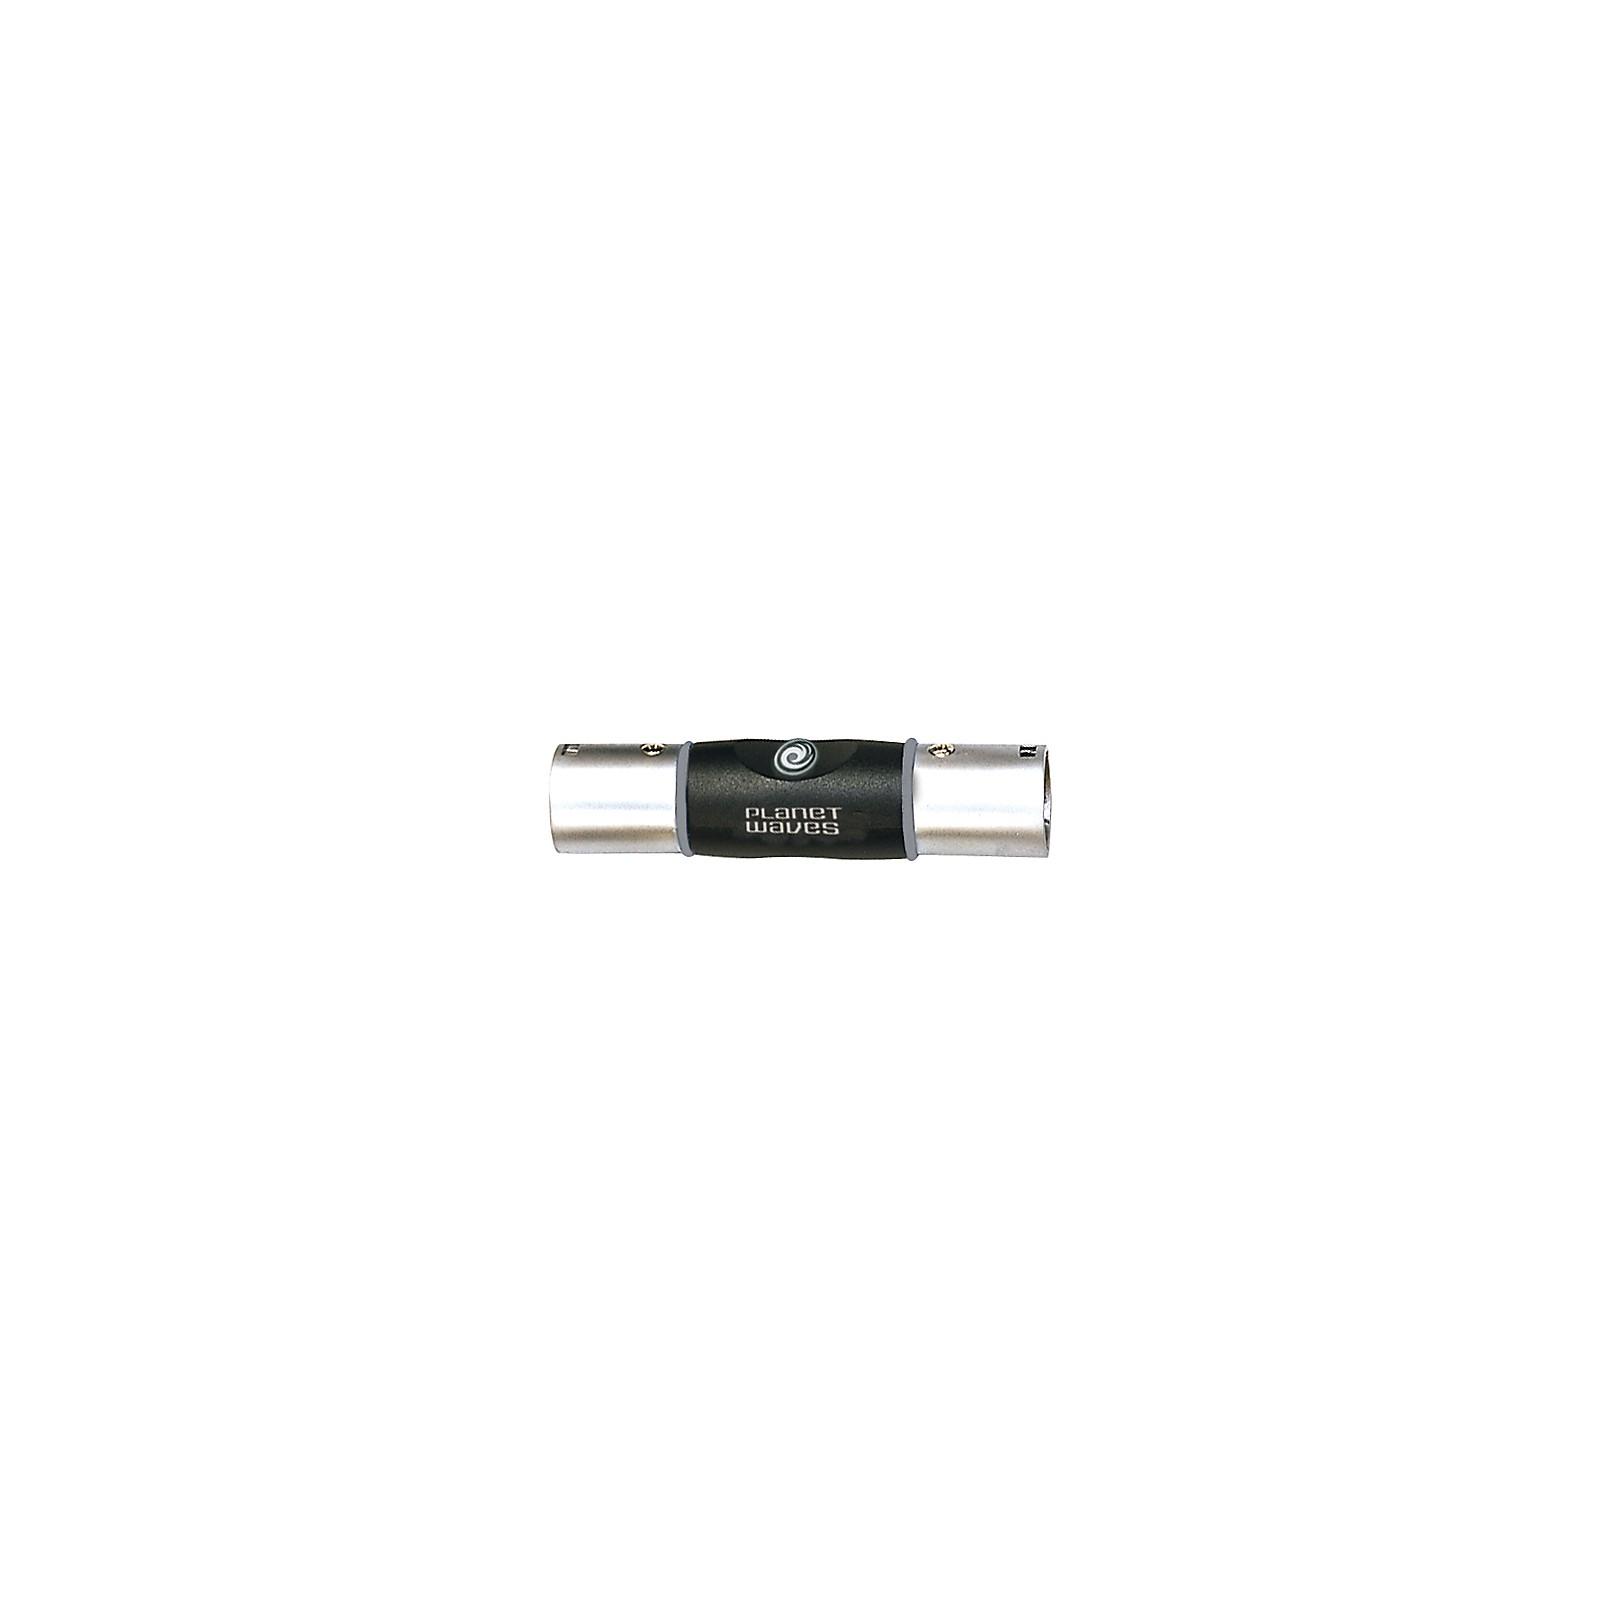 D'Addario Planet Waves XLR Male - XLR Male Adapter (metal shell)